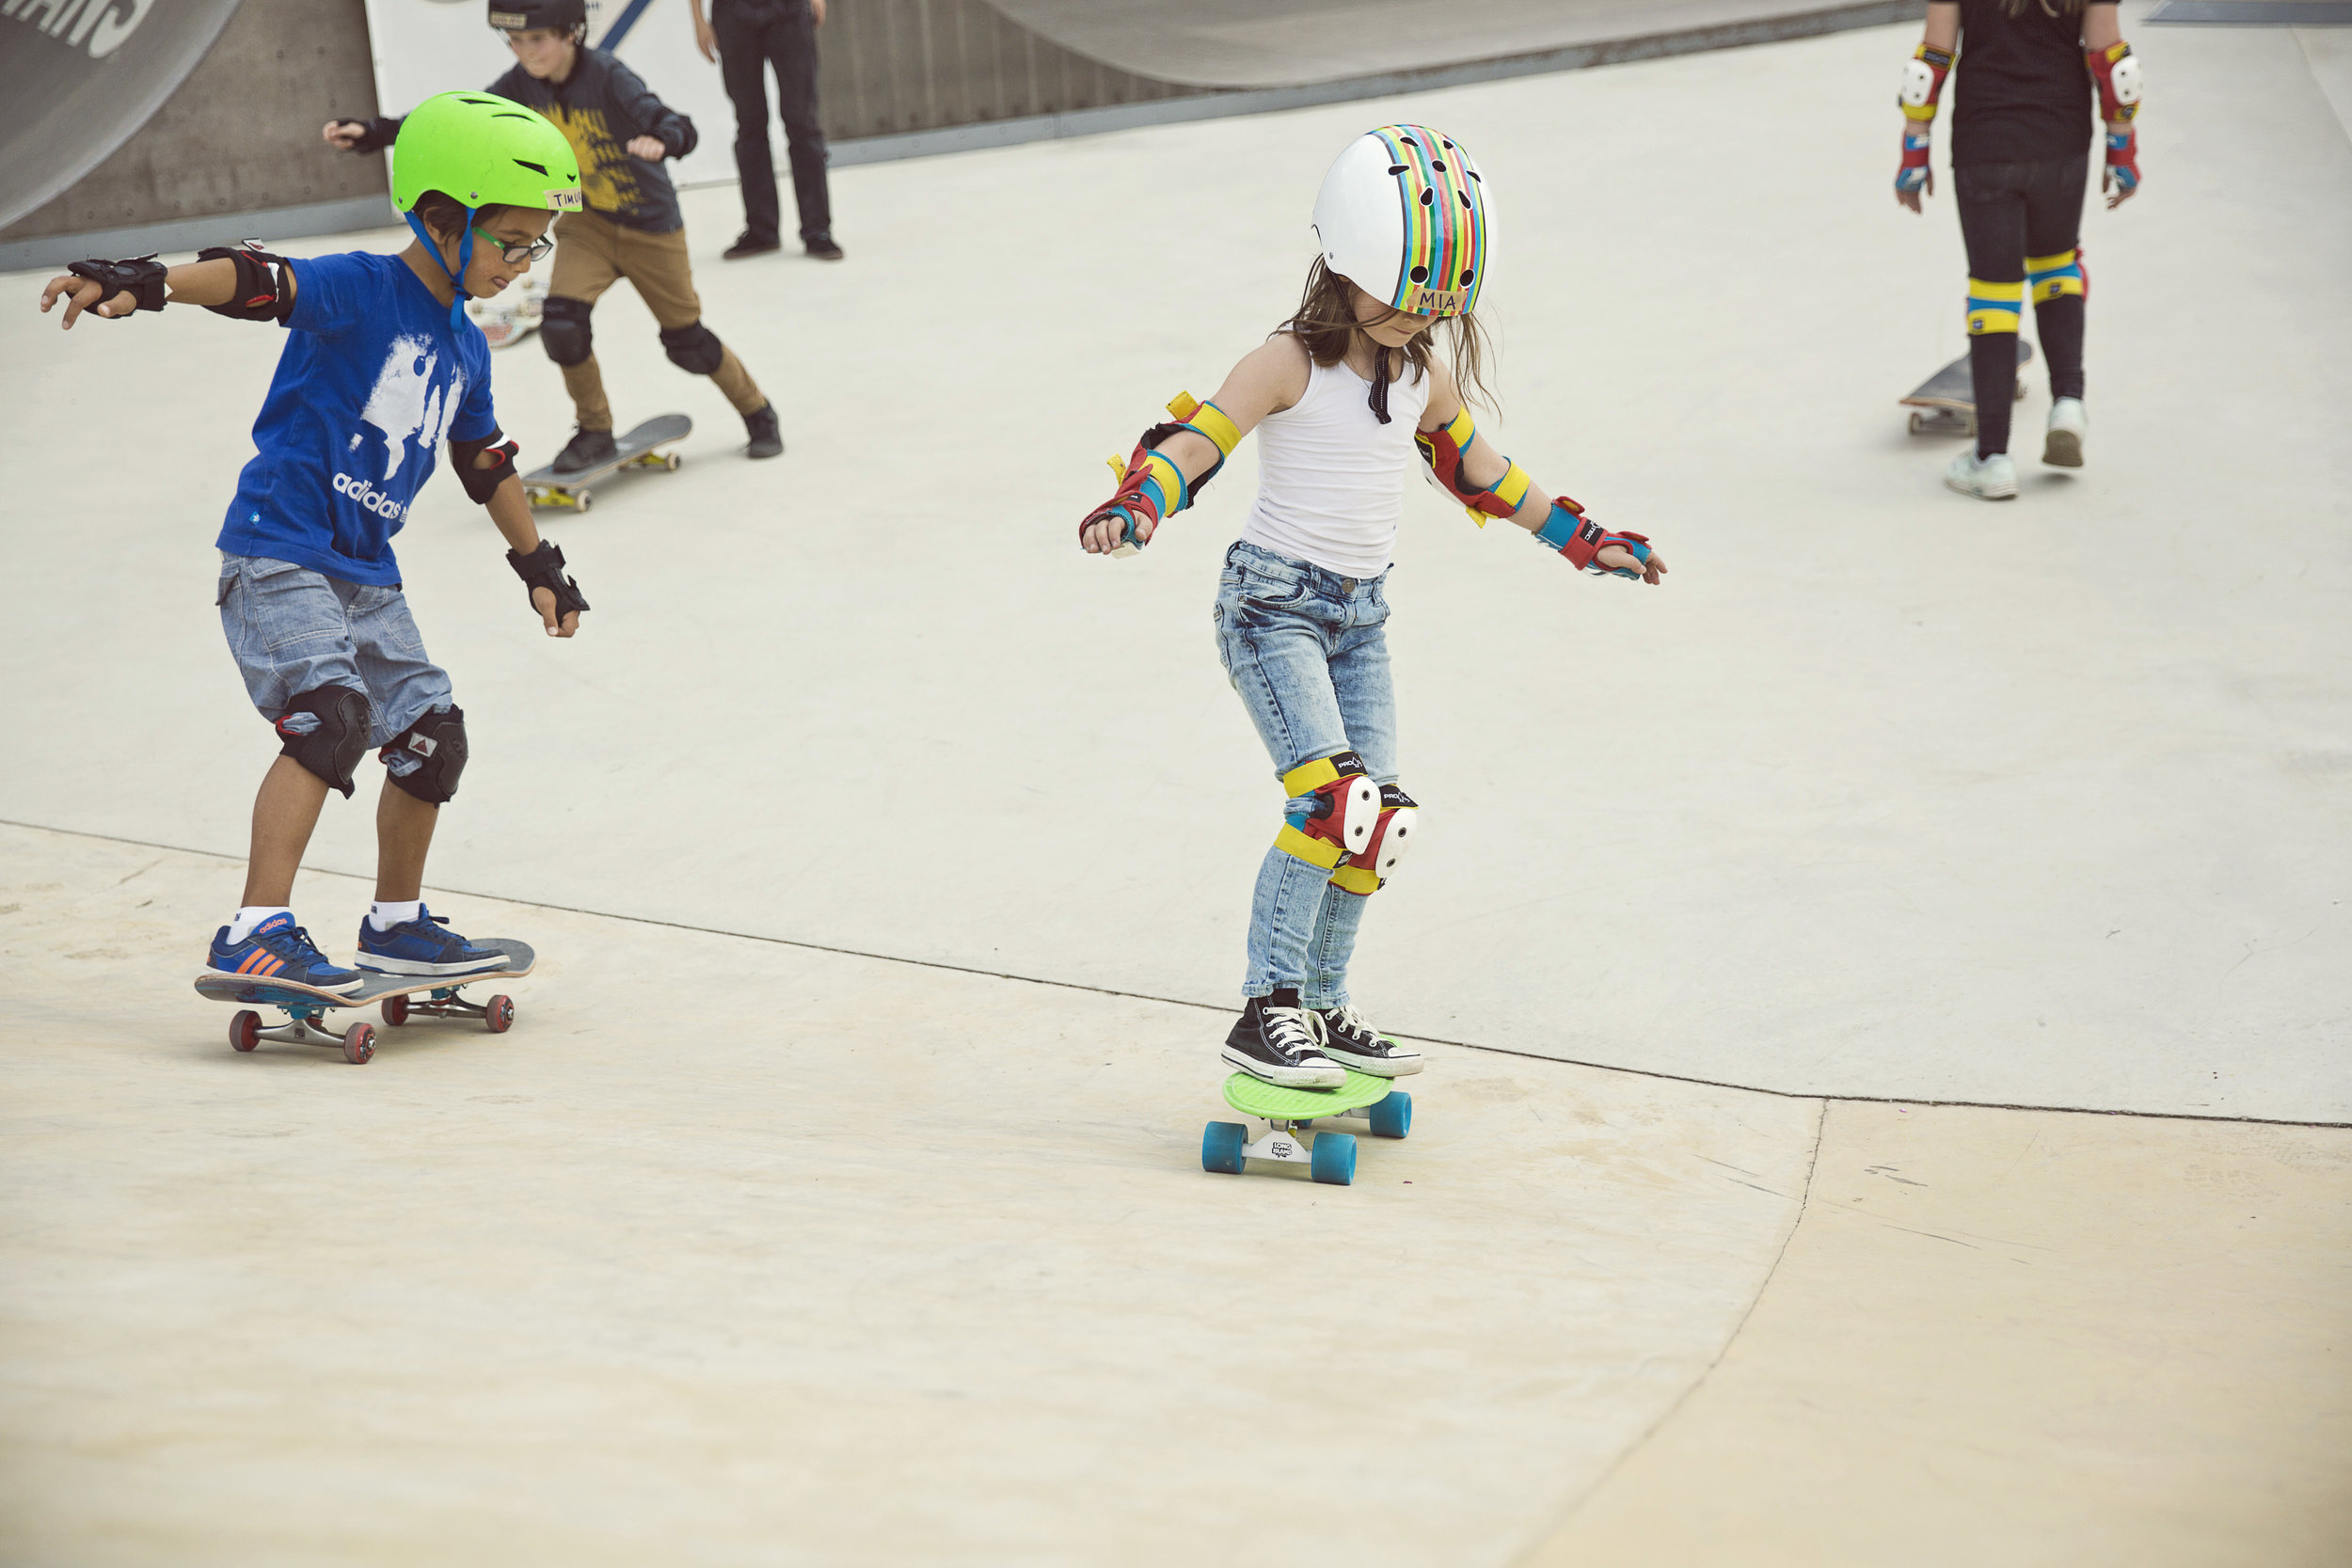 Skateakademie_Haack2016_074.jpg